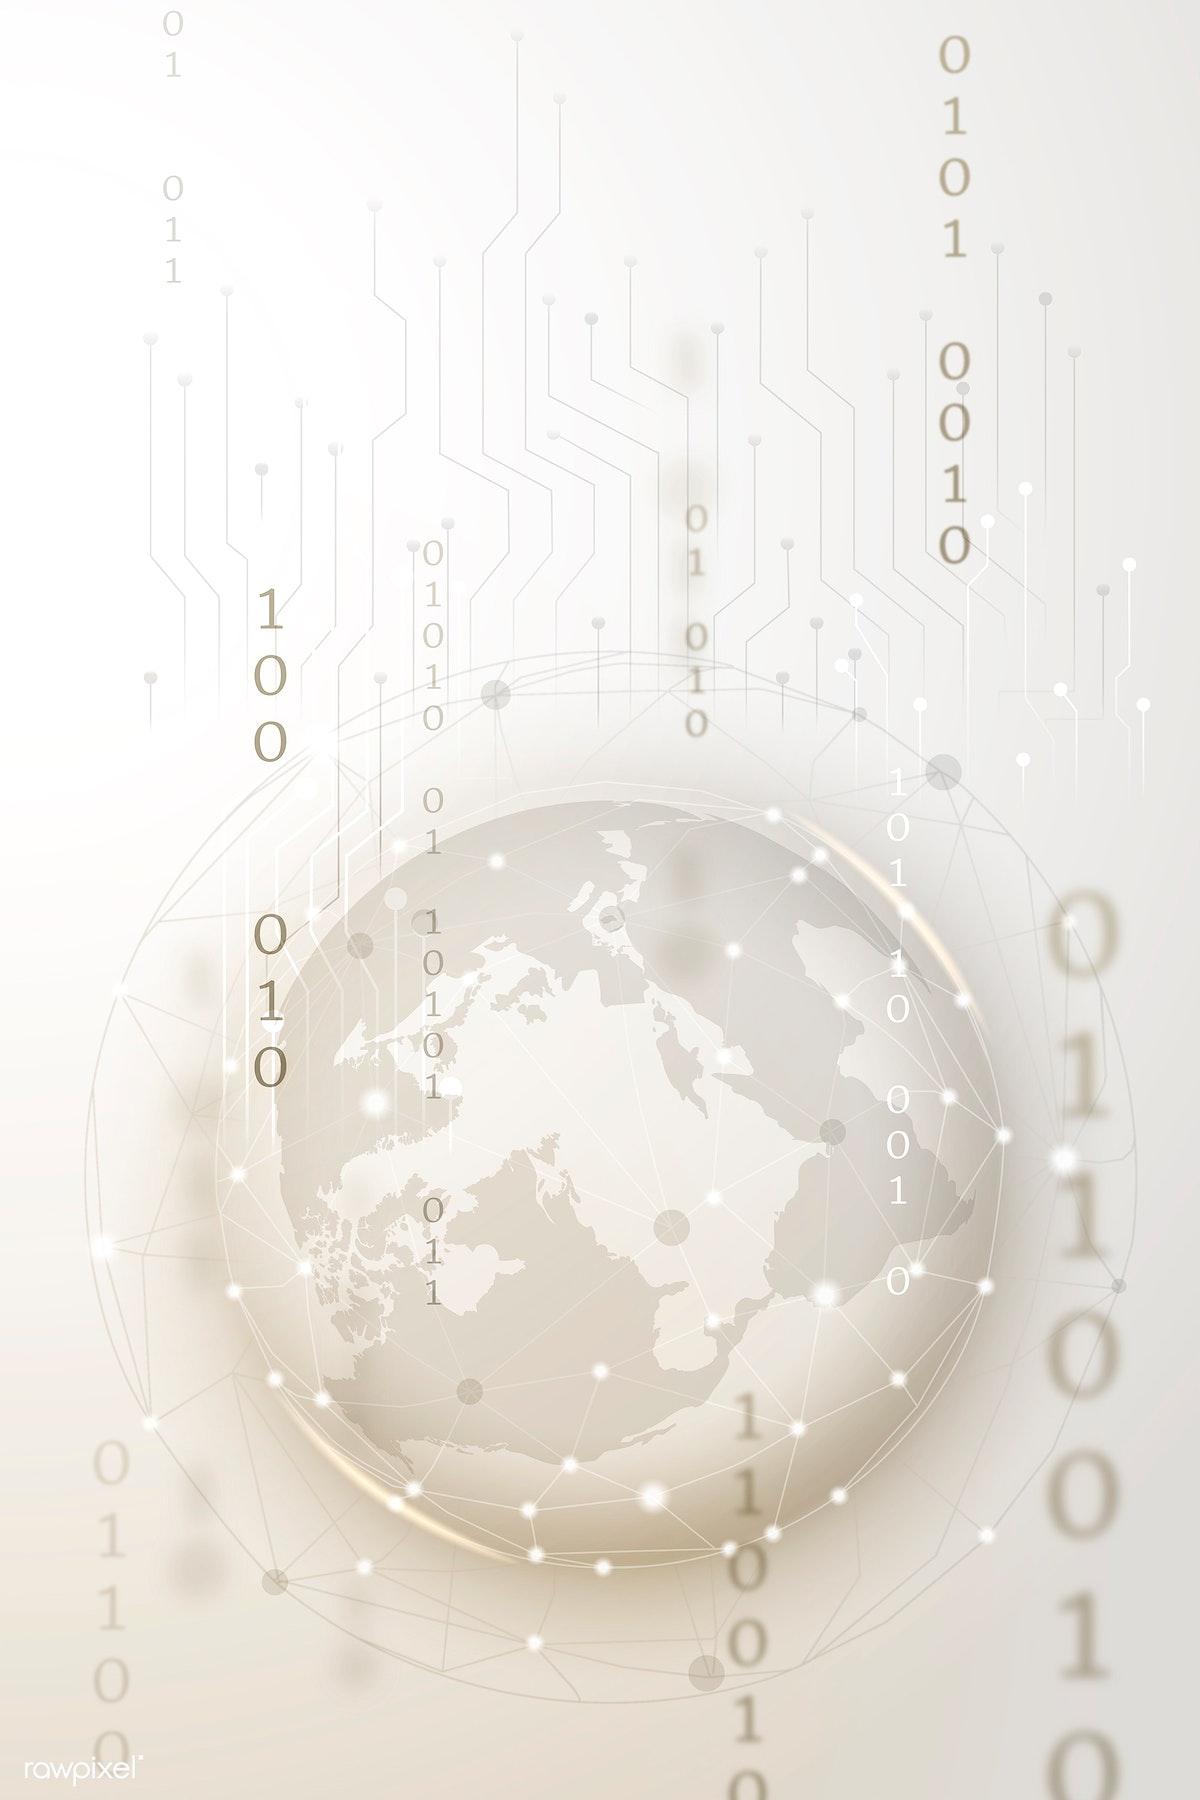 Download premium illustration of Futuristic global network technology